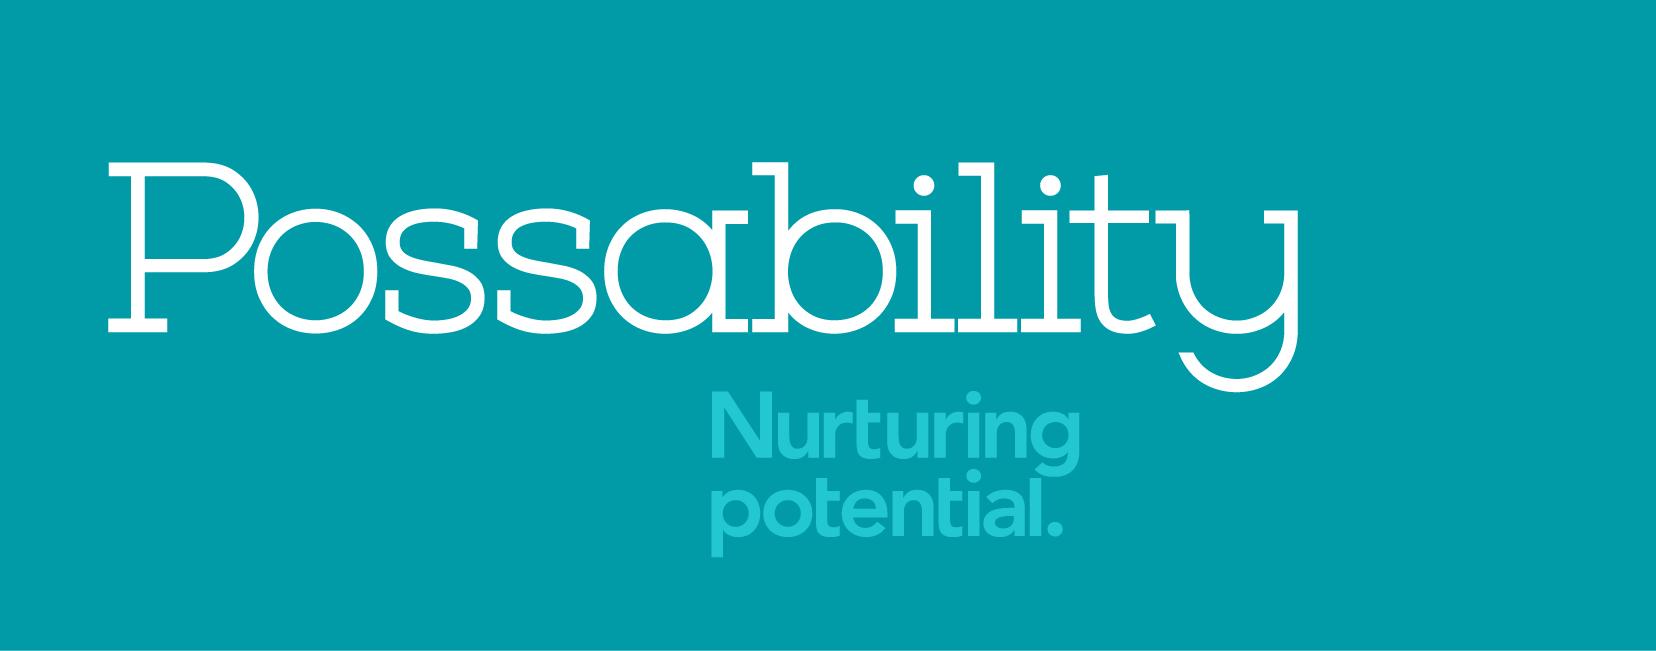 Possability